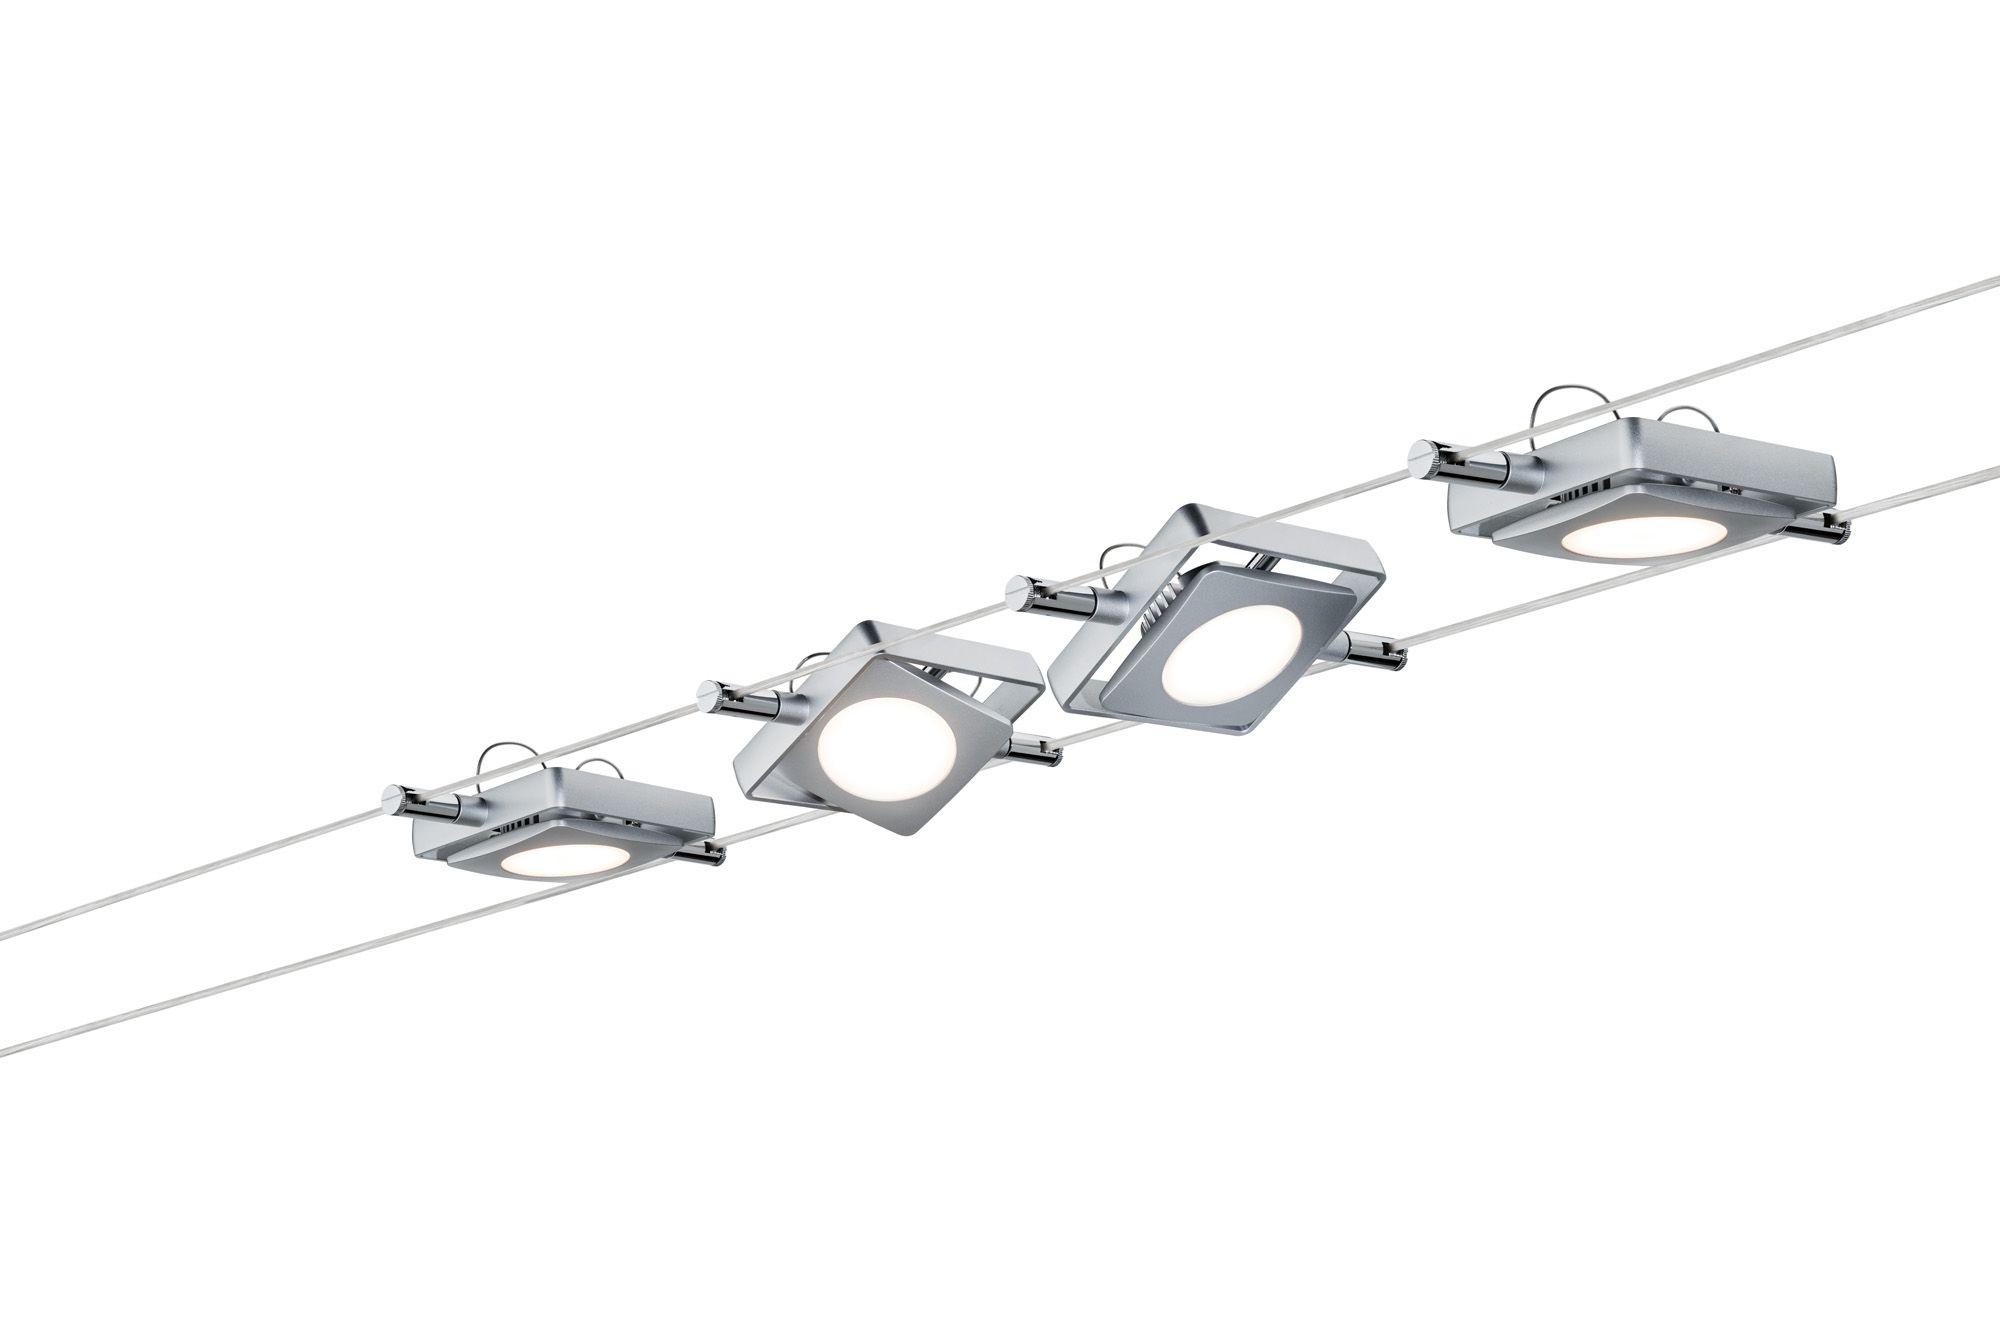 PAULMANN 94107 : Spots LED câbles tendus MAcLED 4*4w